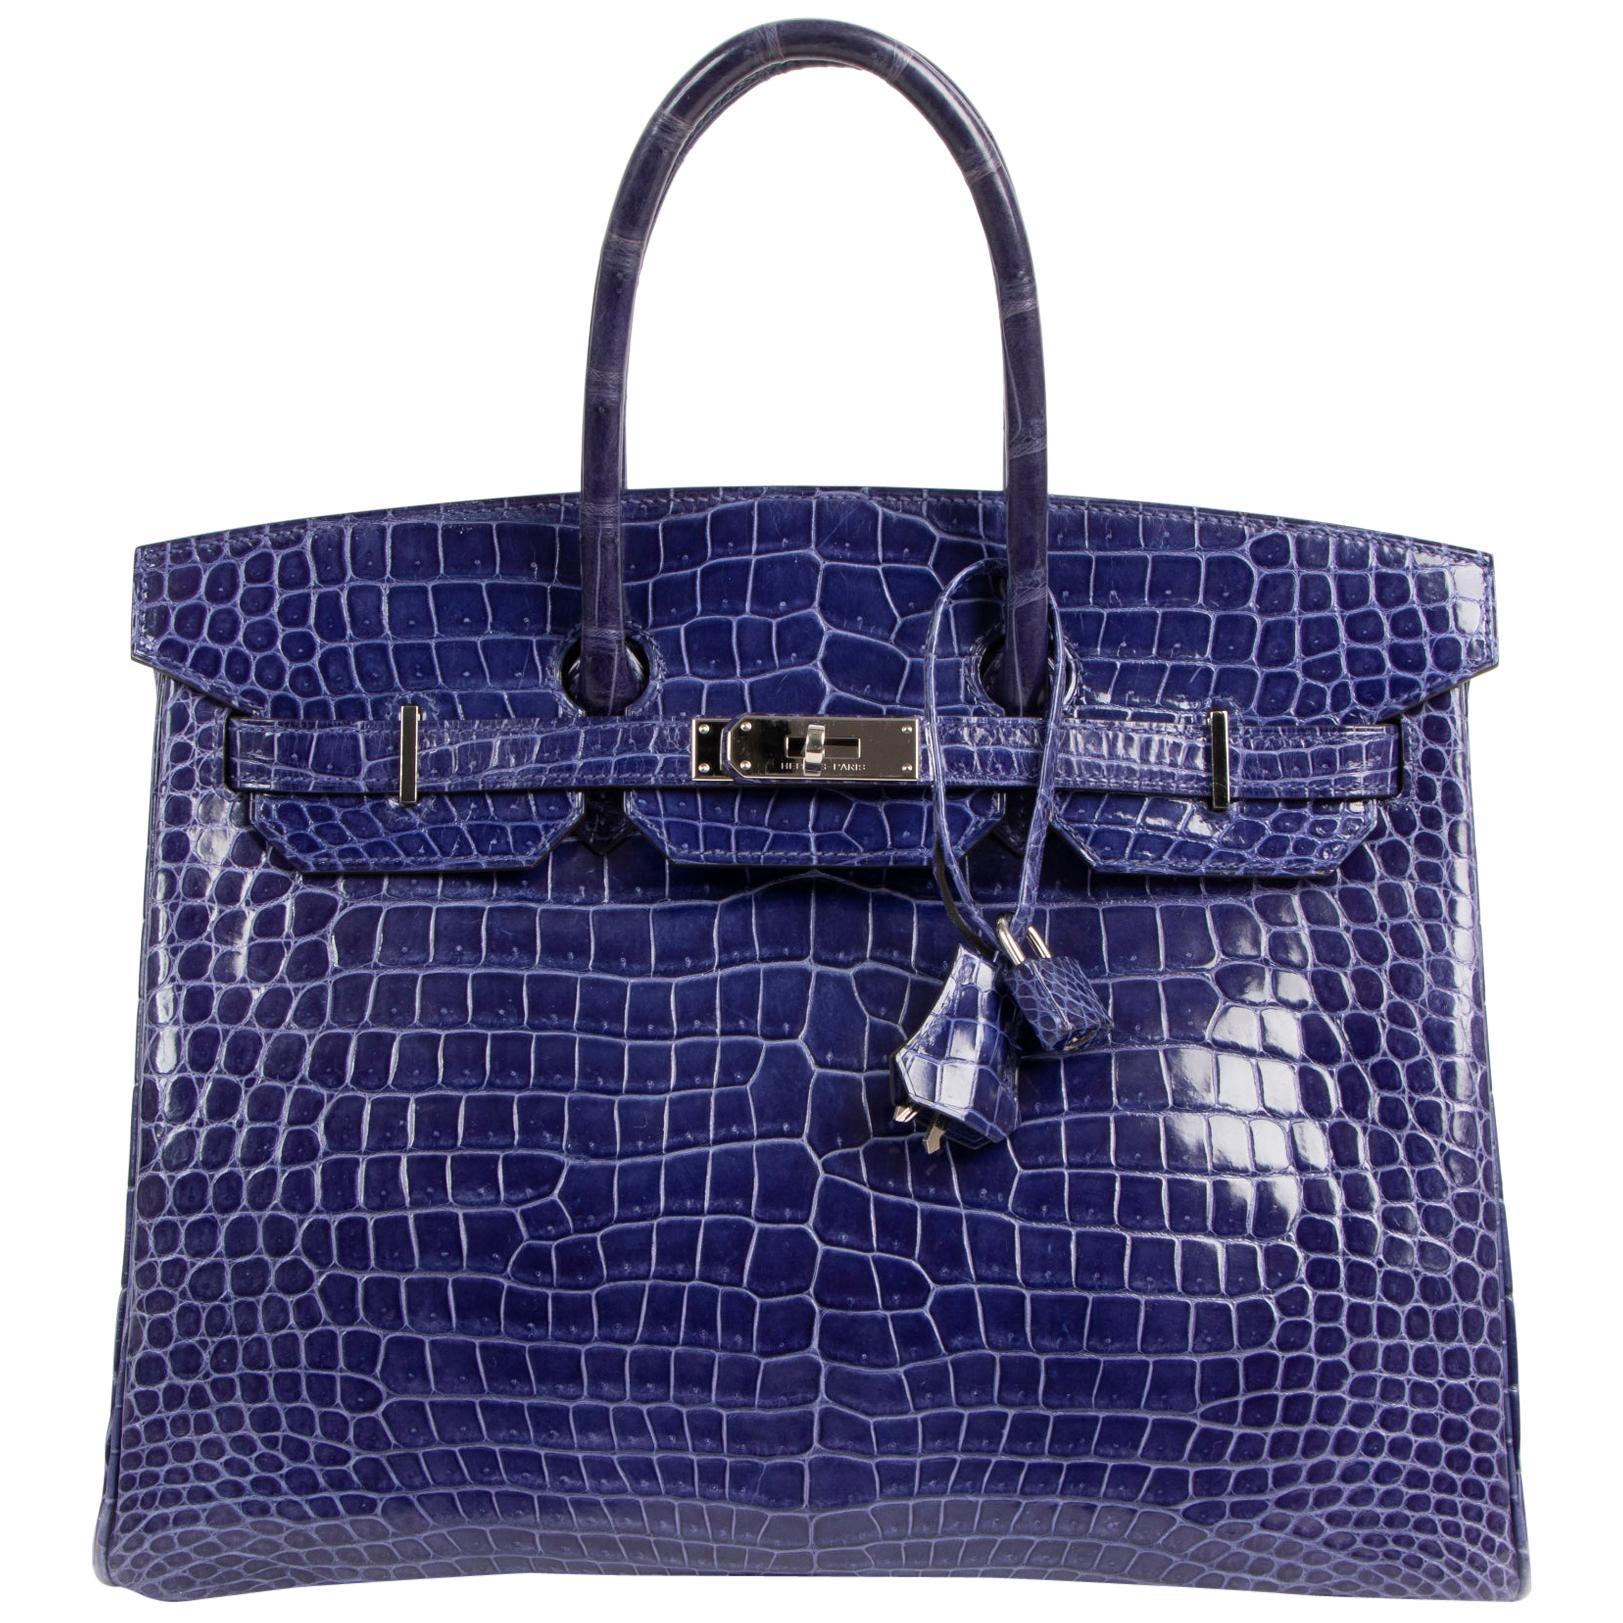 Hermès Birkin 35 Blue Electrique Crocodile Porosus PHW